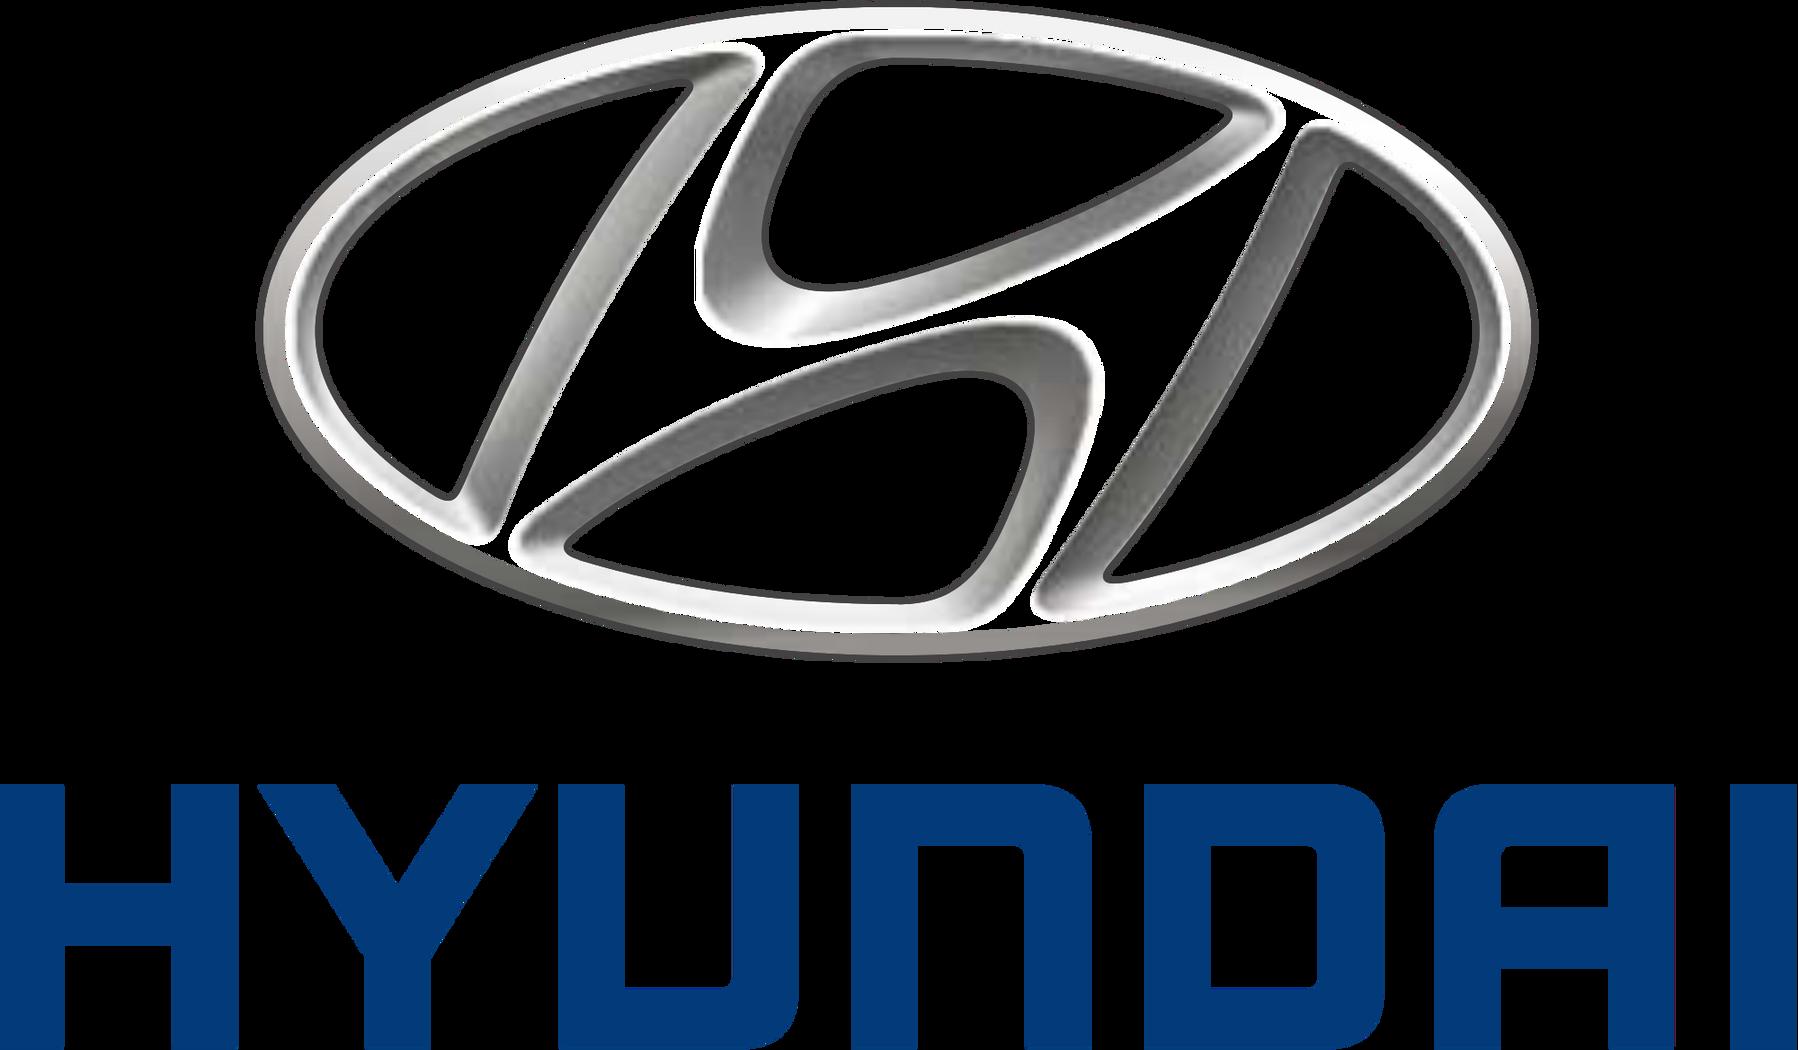 Hyundai-logo-download-png.png